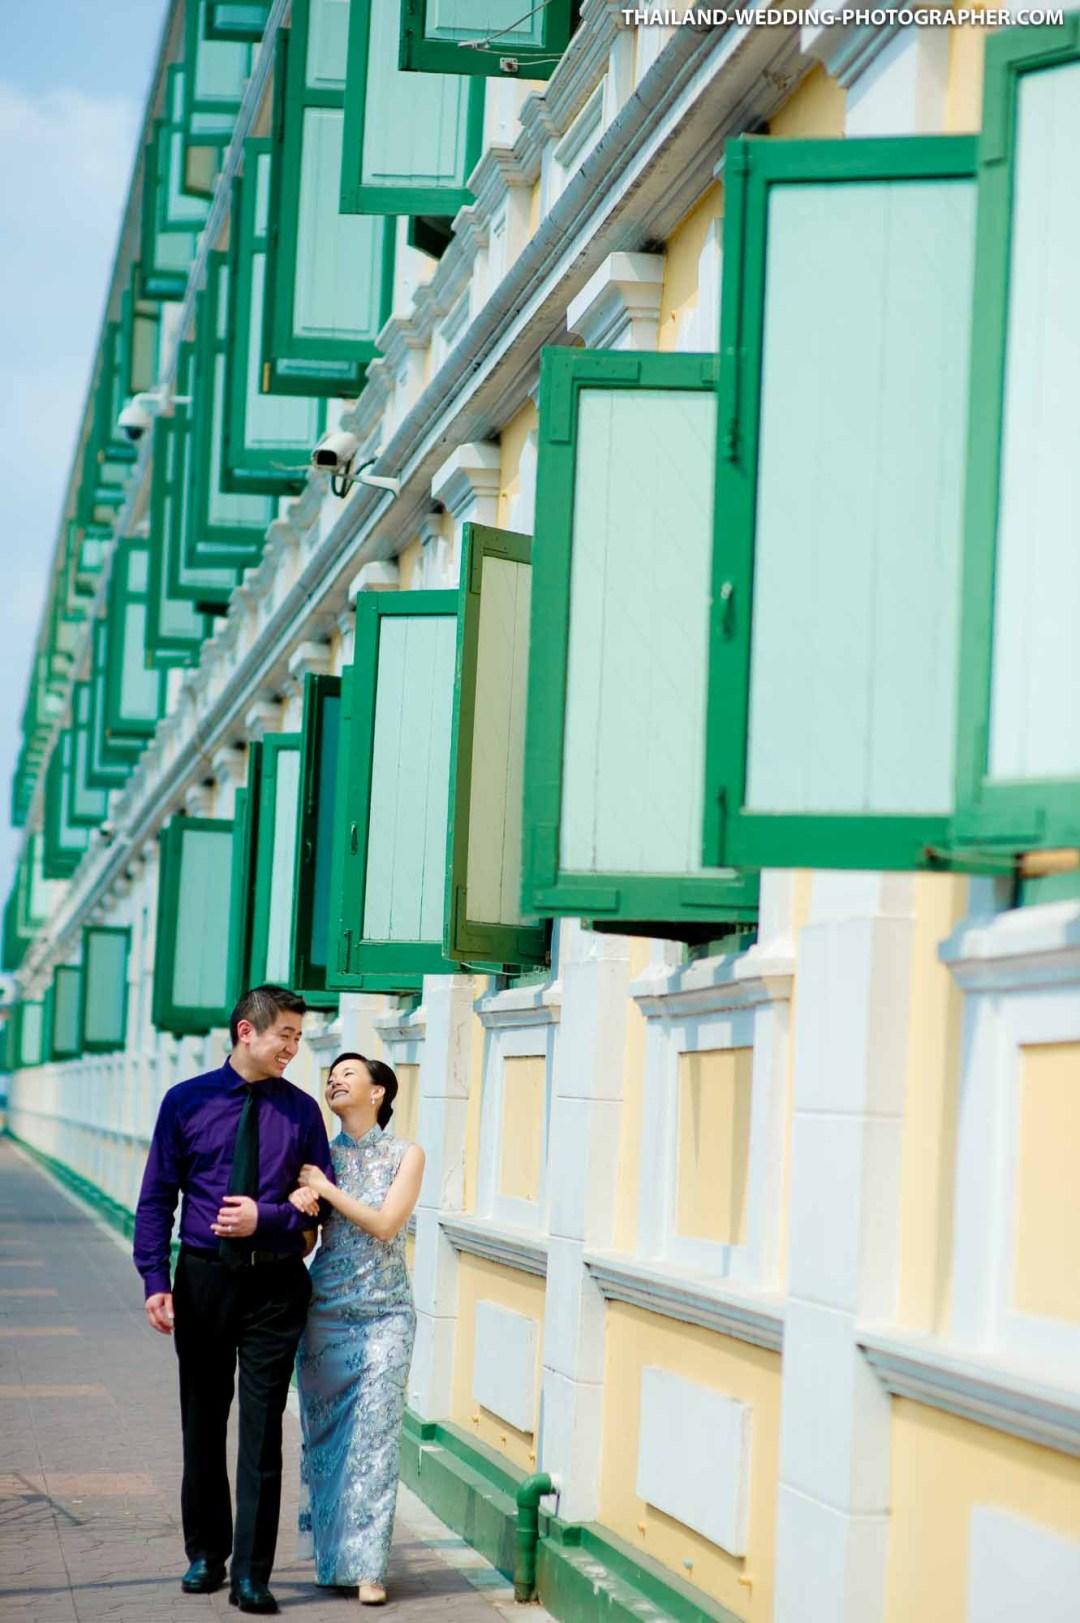 Ministry Of Defense Bangkok Thailand Wedding Photography